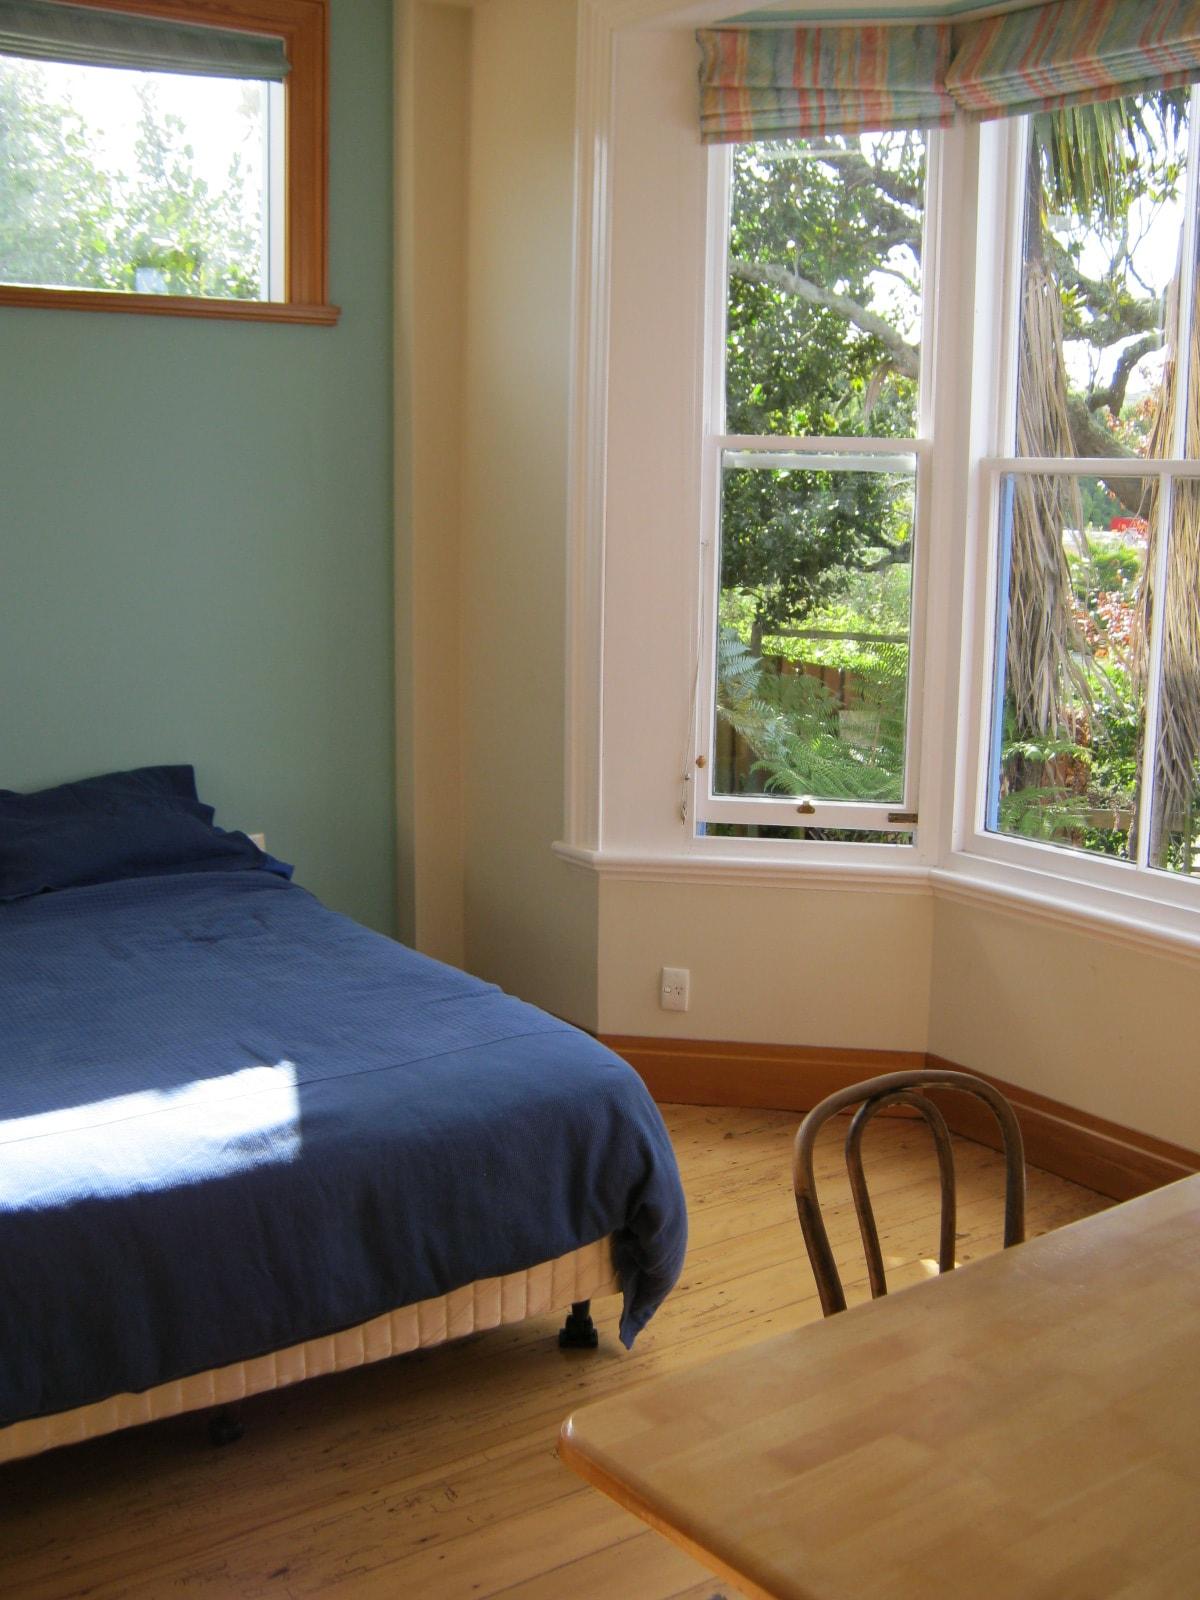 Queen bed, bay window looking out over garden